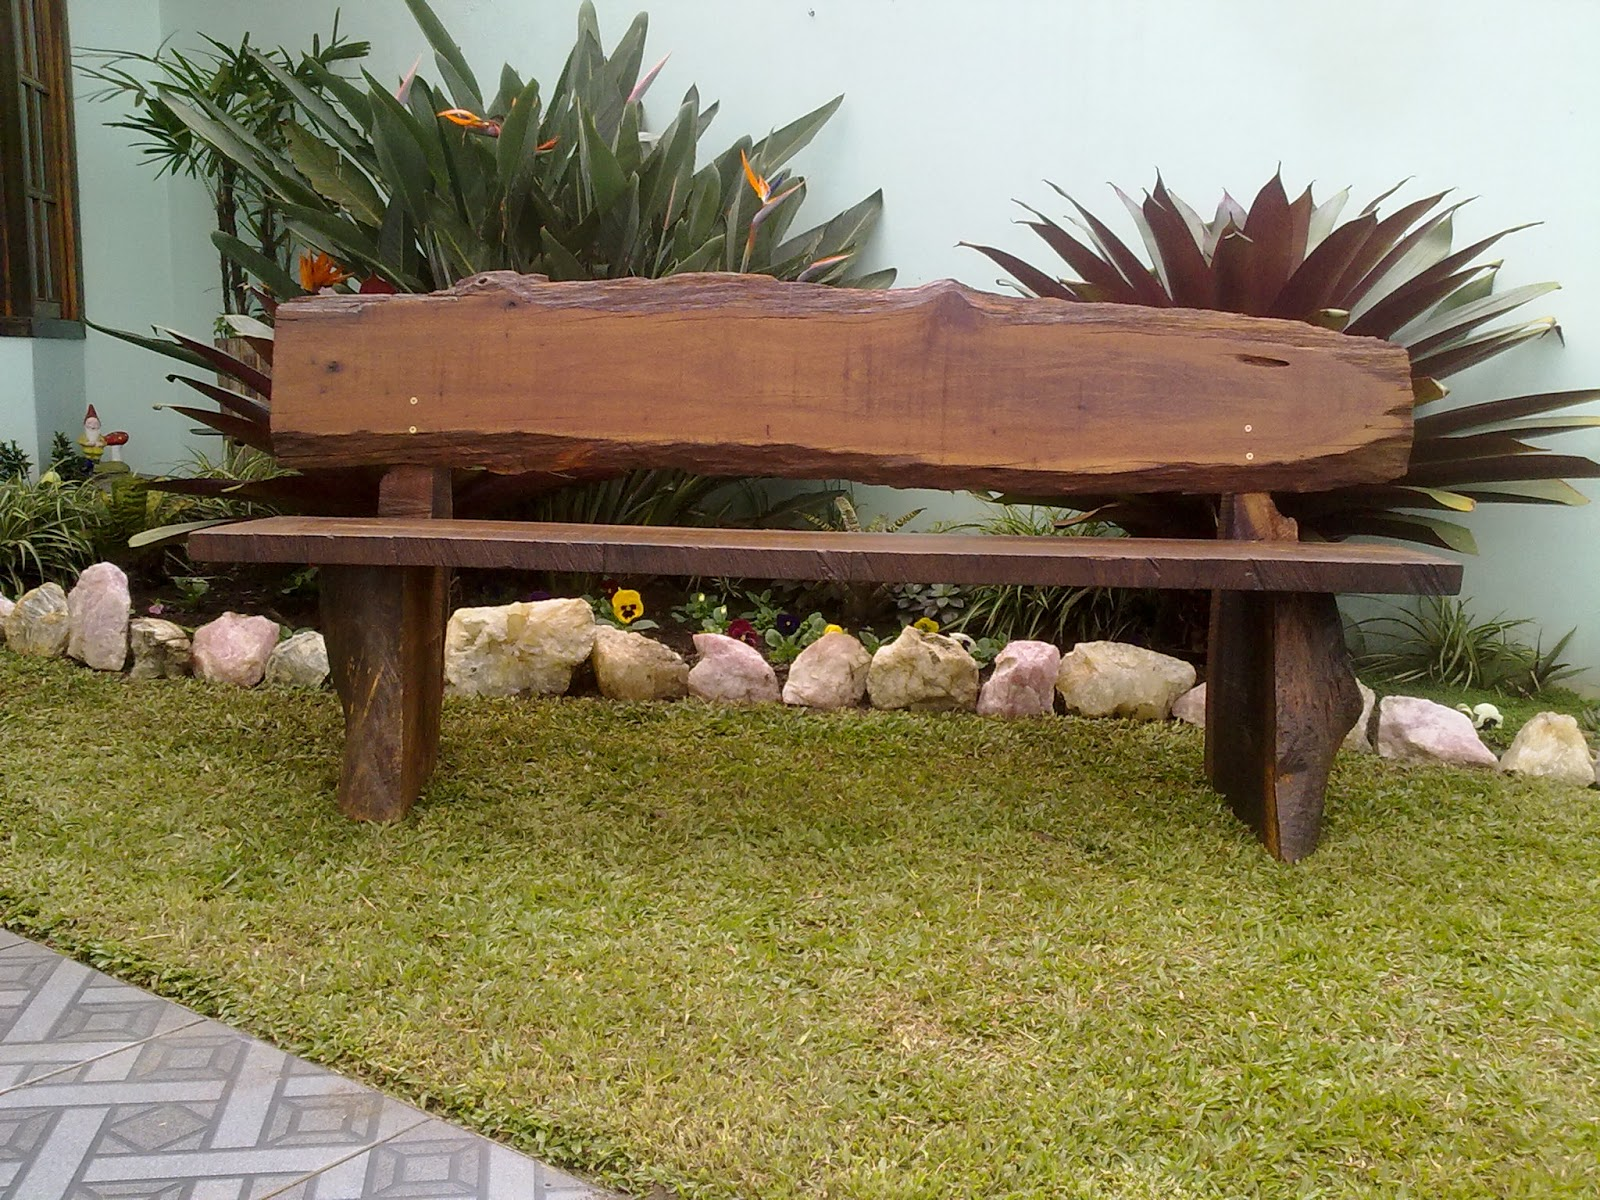 Cachepots Marcenaria Artesanal: Bancos para jardim em Imbuia #8F773C 1600x1200